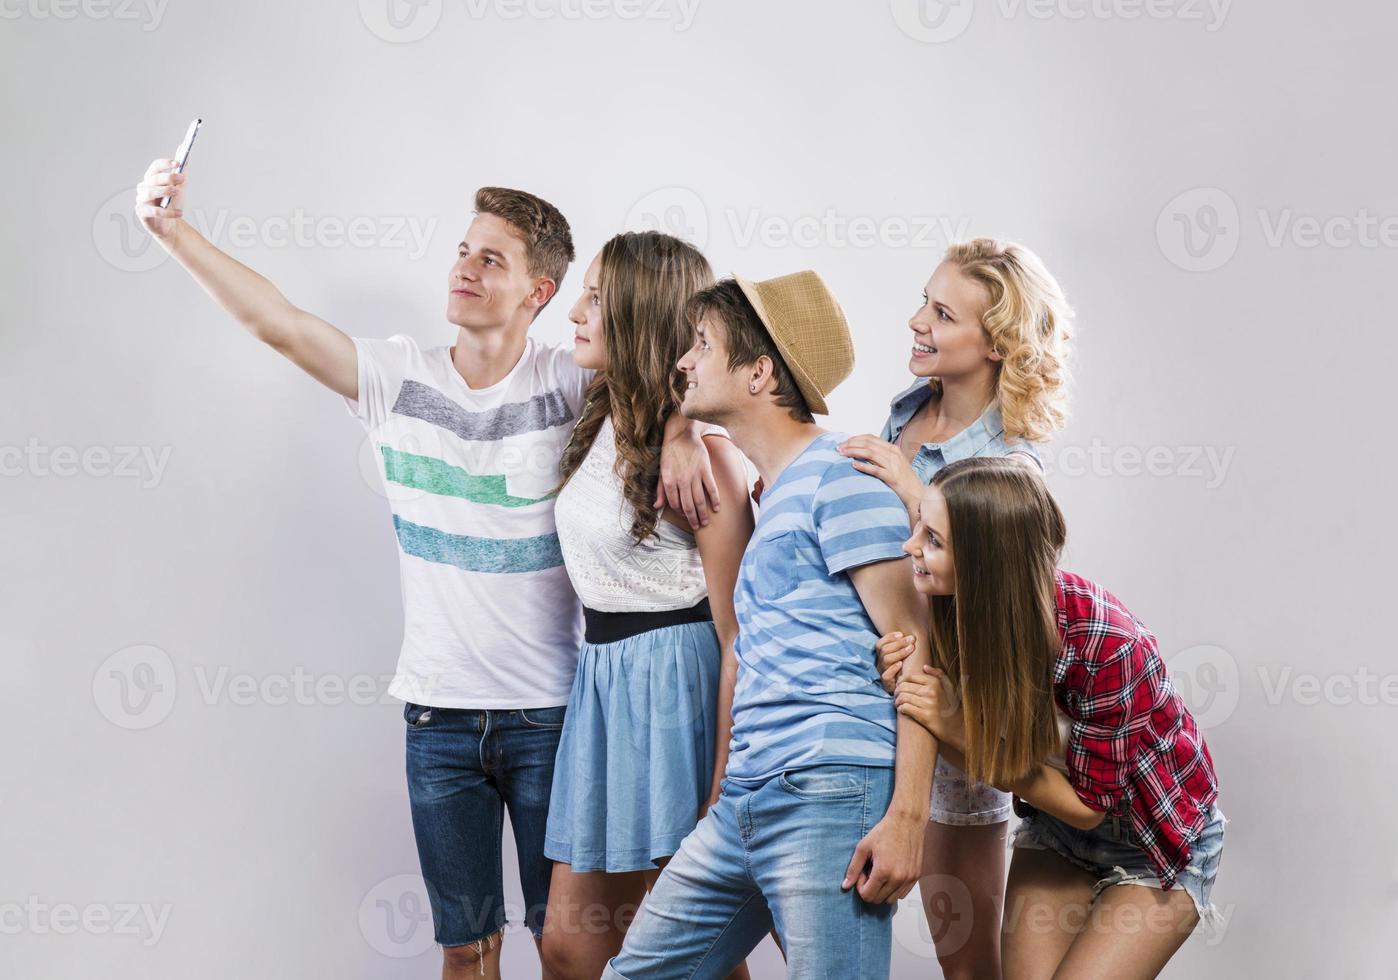 vackra unga människor foto